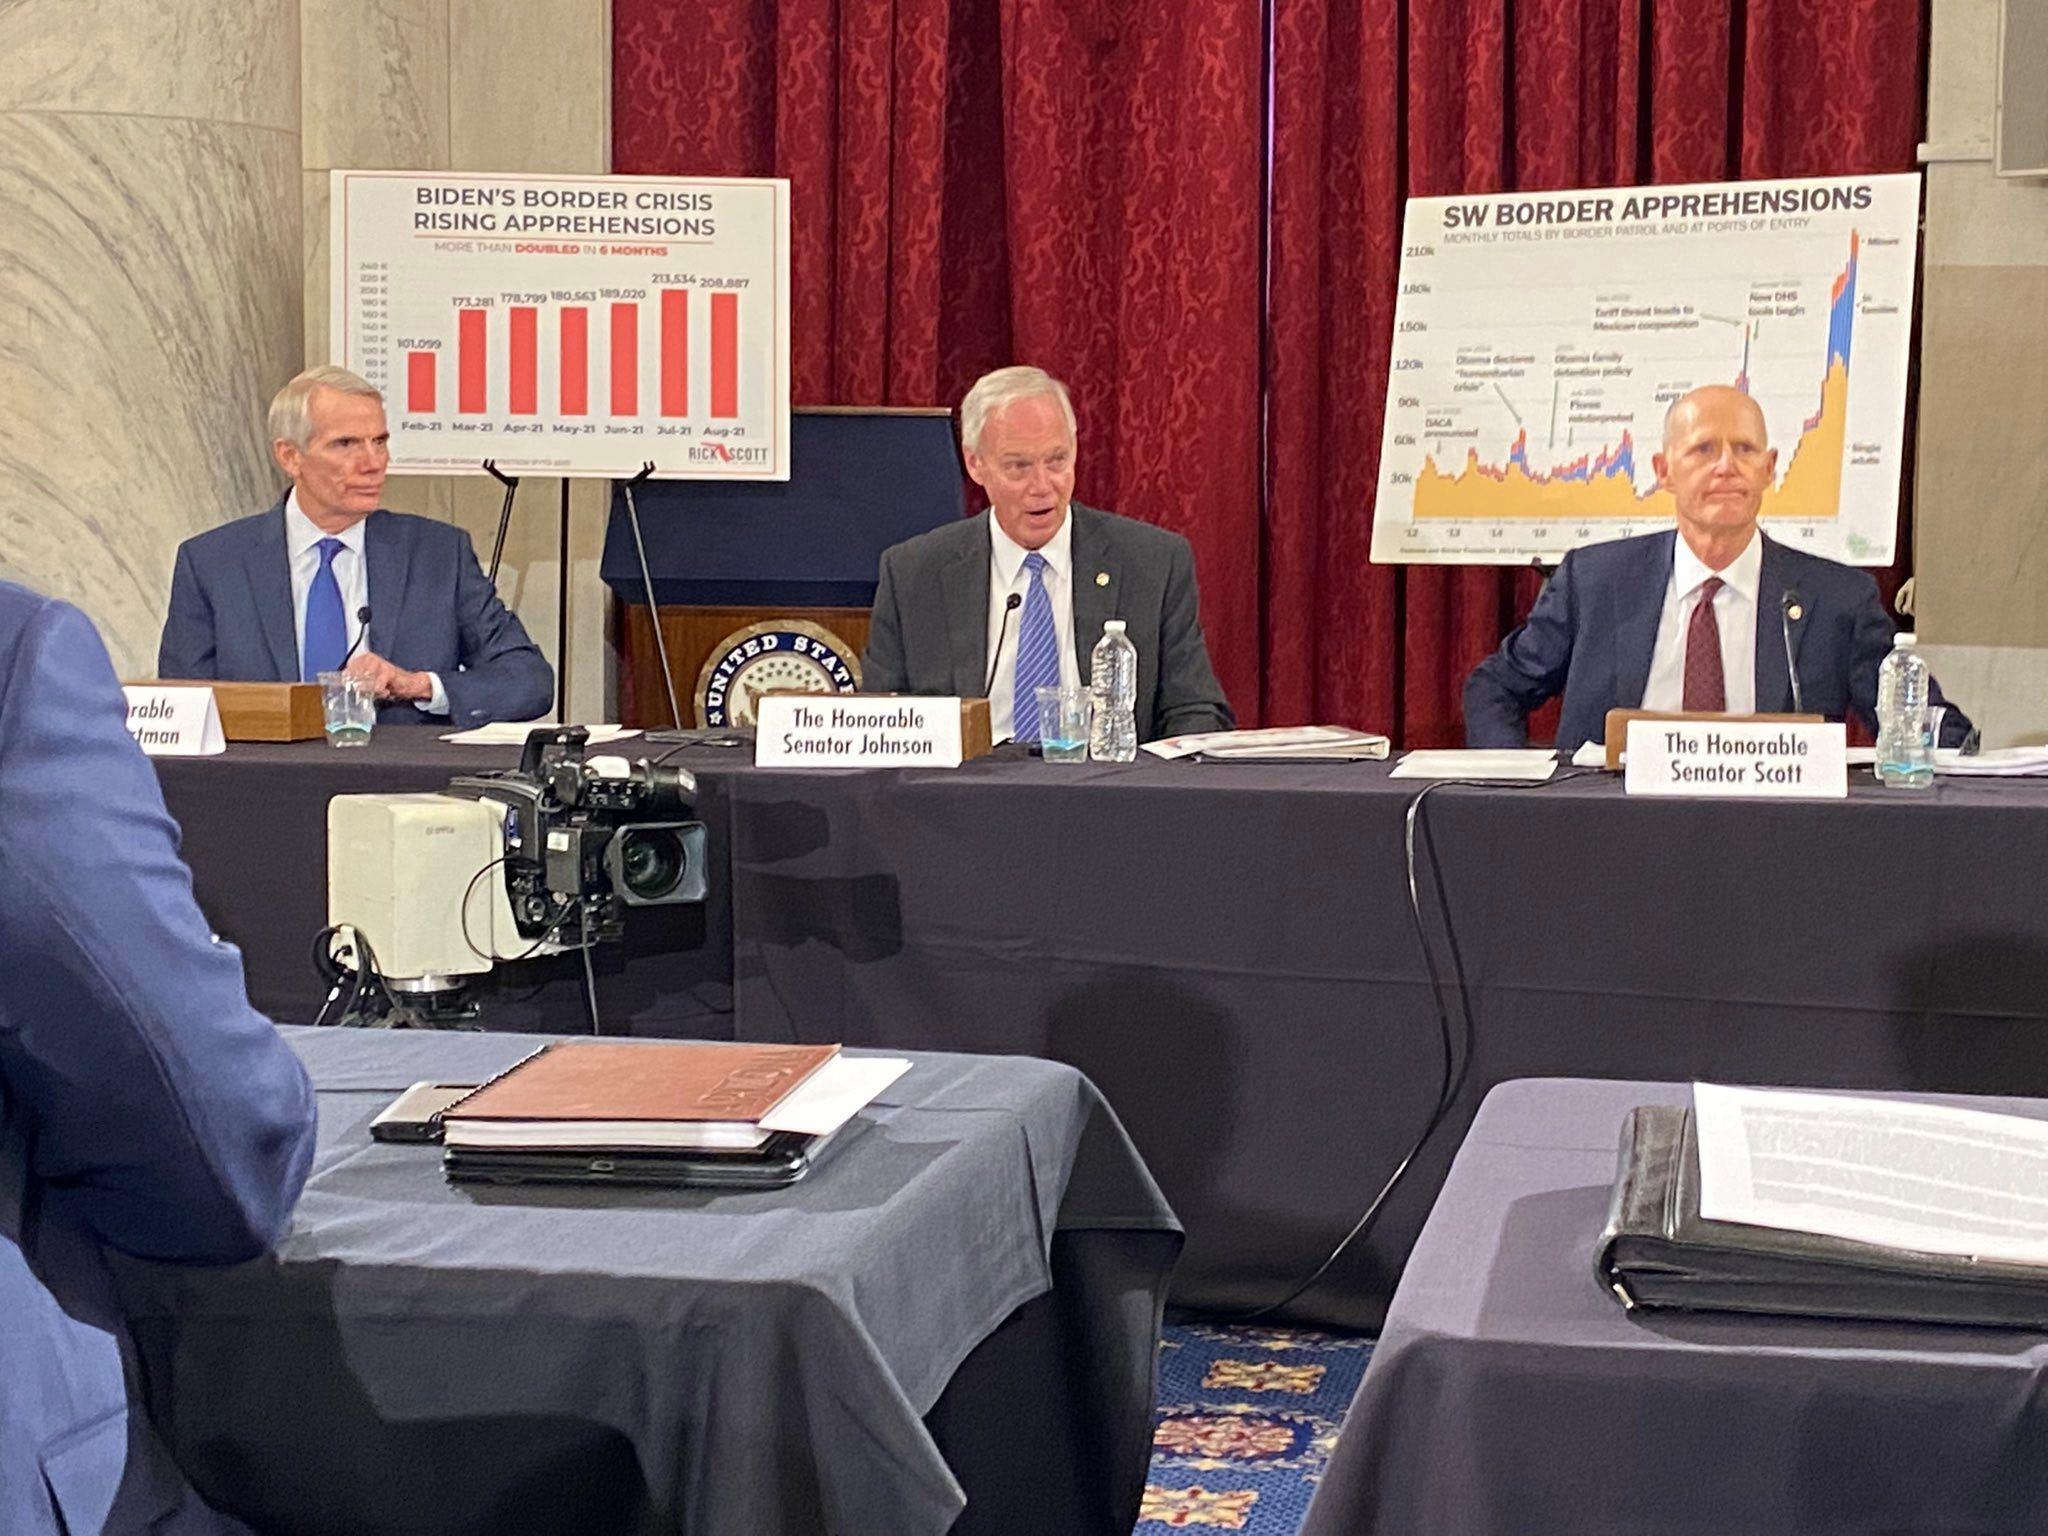 Senate Republicans slam Biden for border crisis, allege Dems won't hold a hearing on migrant surge https://static.foxnews.com/foxnews.com/content/uploads/2021/10/Portman-Scott-Johnson-immigration-roundtable-border.jpeg